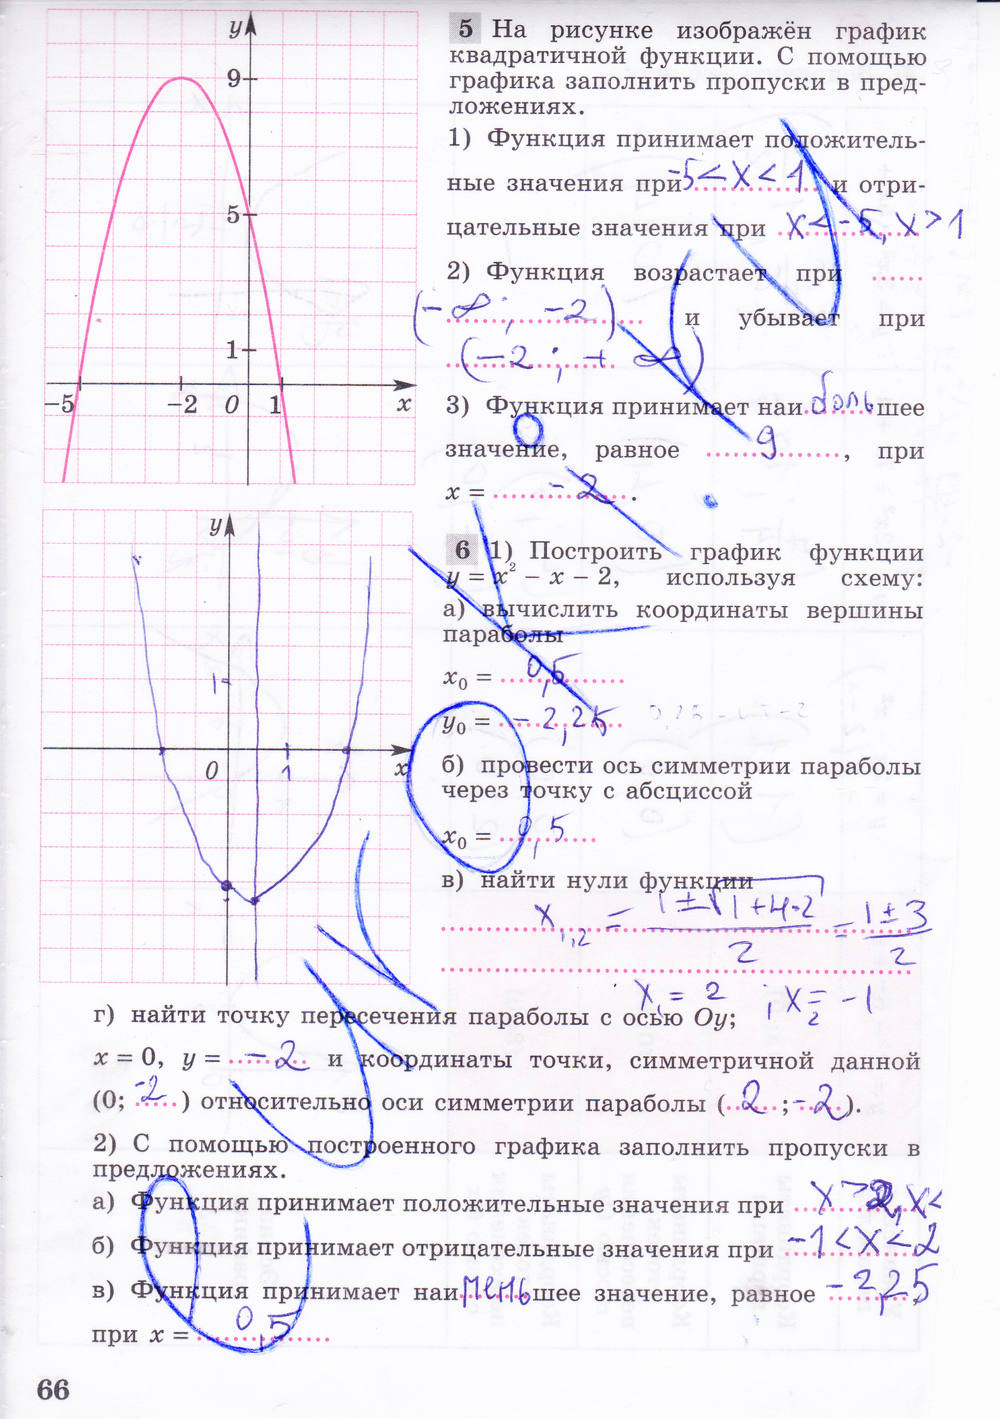 алгебре шубин федорова ткачева по класс гдз колягин 10